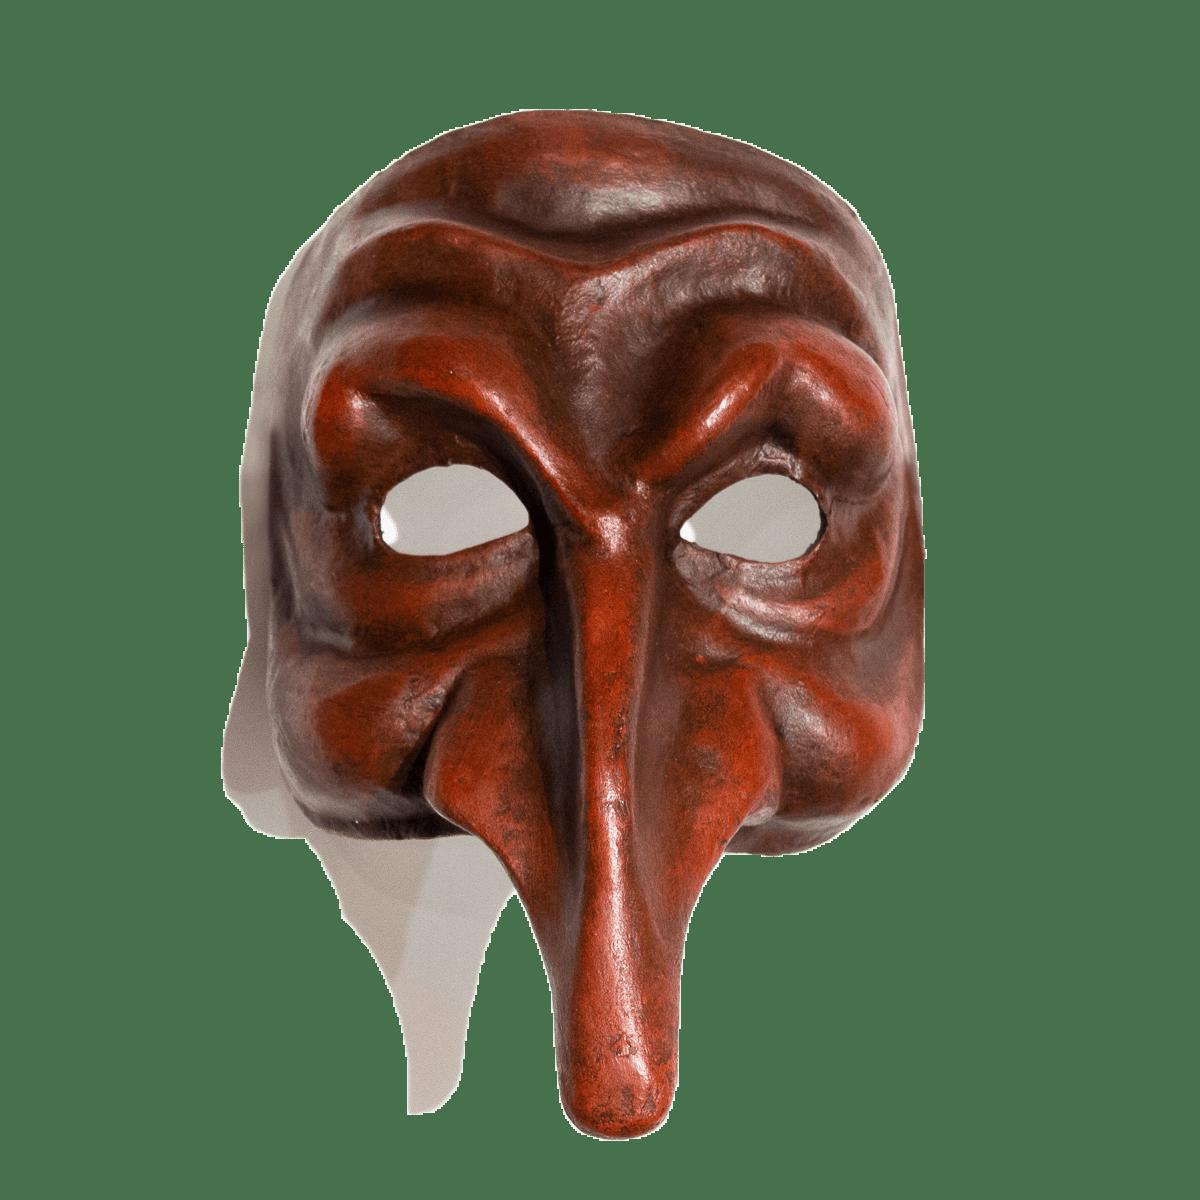 https://i1.wp.com/www.masksvenice.com/wp-content/uploads/2018/09/cartapesta-pantalone.png?fit=1200%2C1200&ssl=1